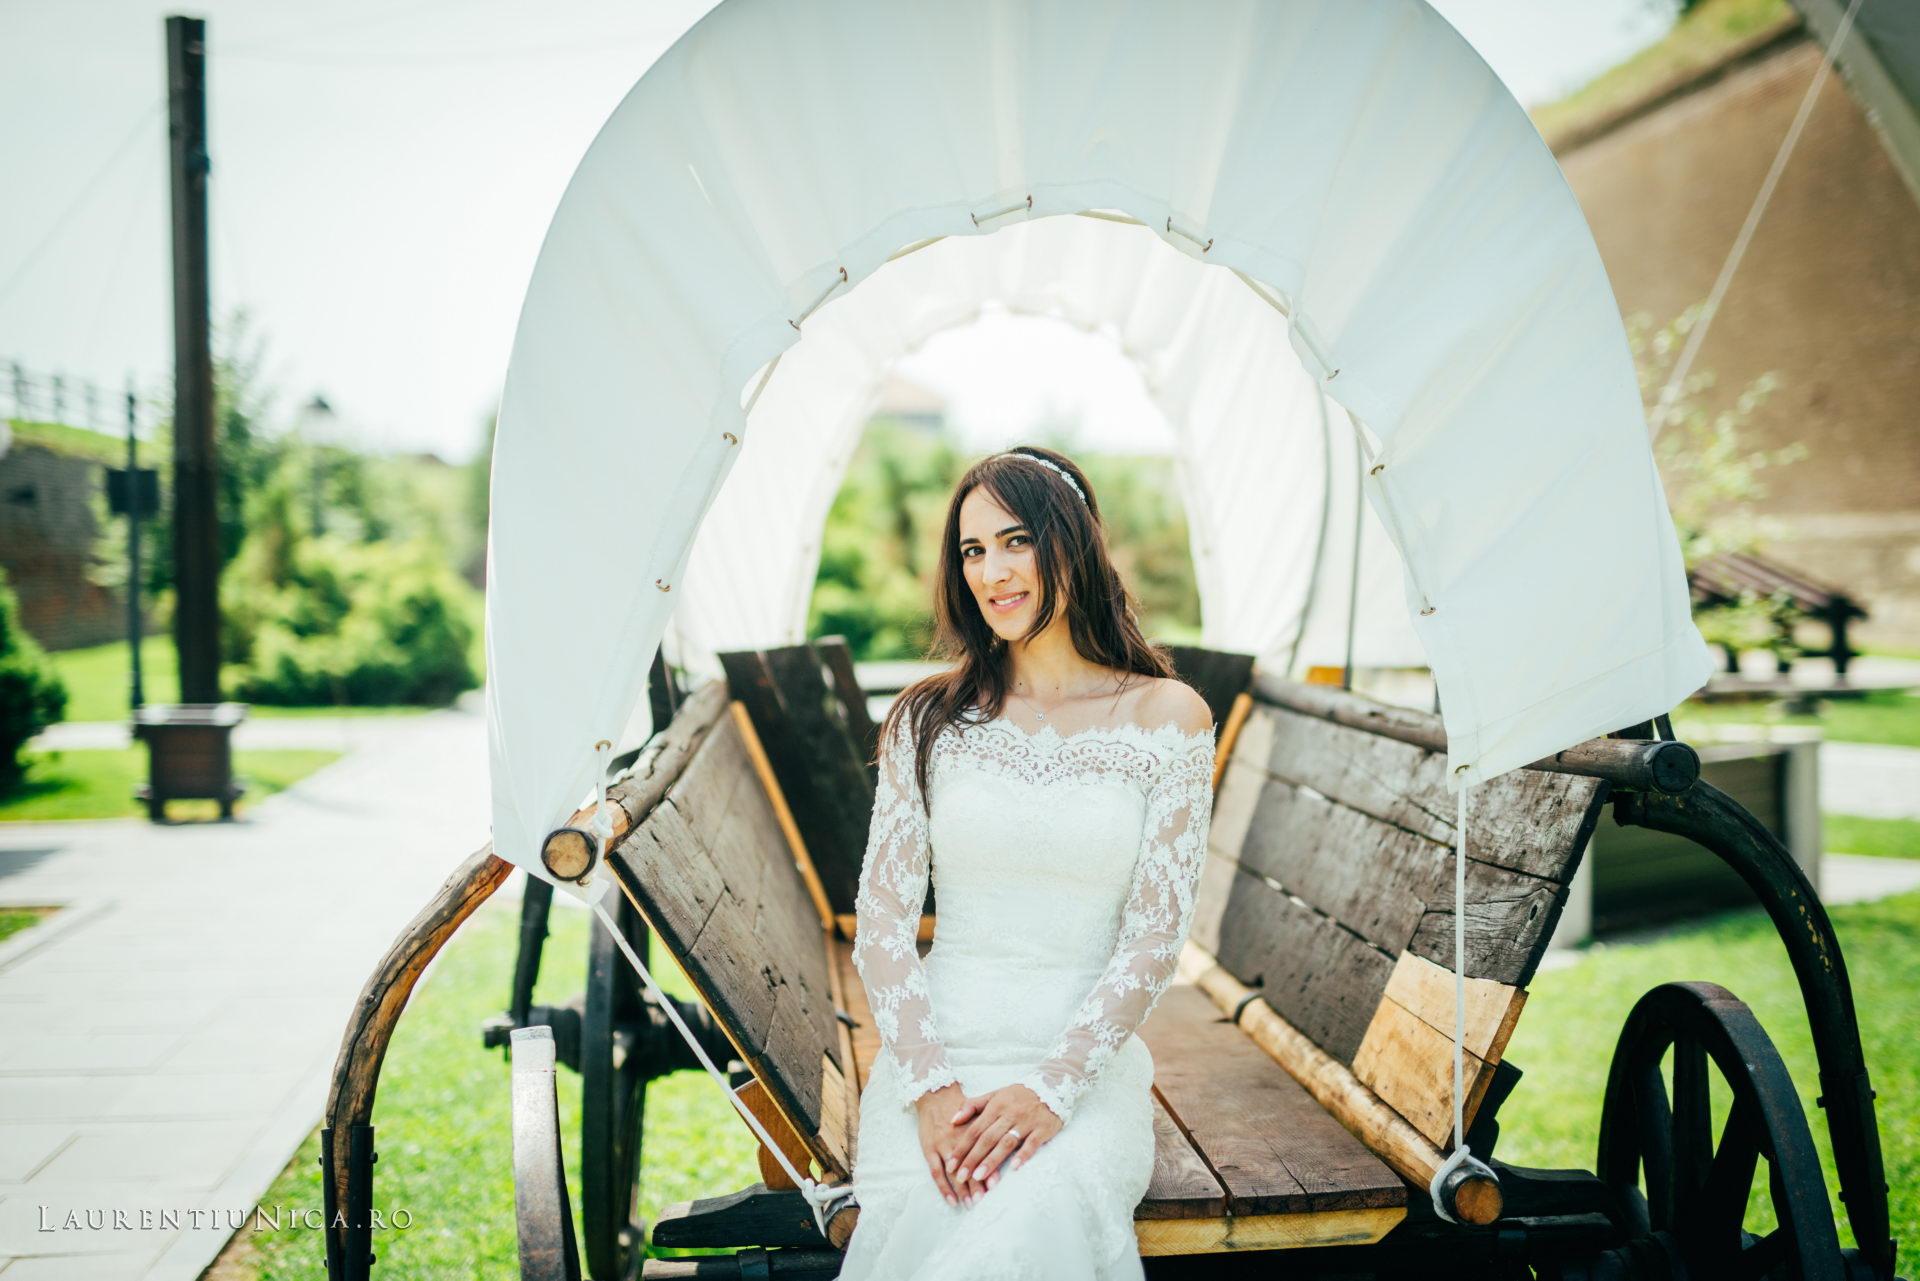 cristina_si_ovidiu-after-wedding-alba-iulia_fotograf_laurentiu_nica_28